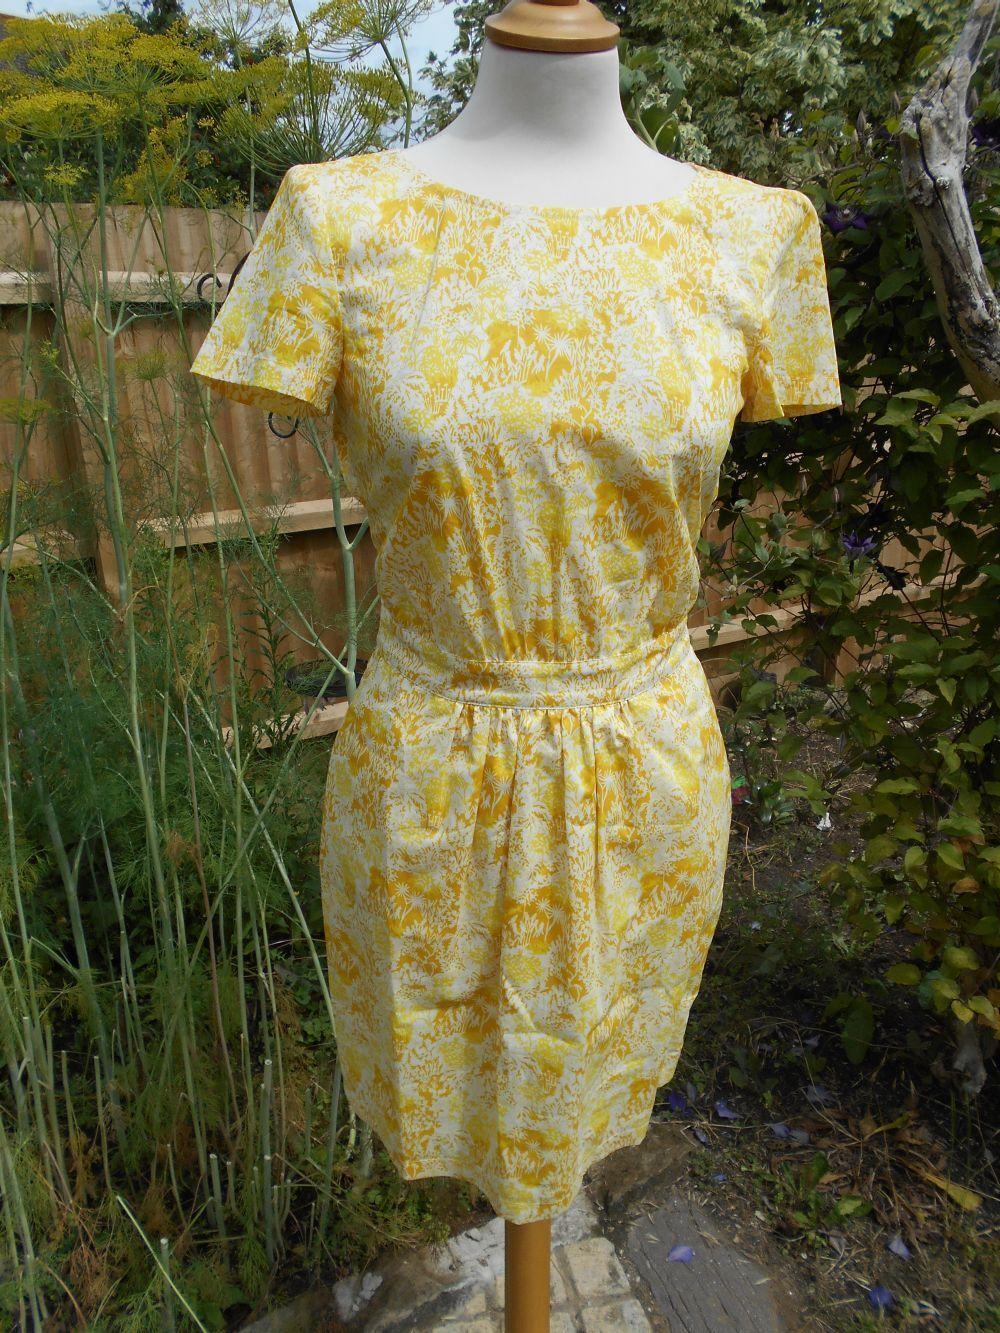 Sessun Liberty Tana Lawn Cotton Soft Gelb Dress Backless BNWT Wedding Races S